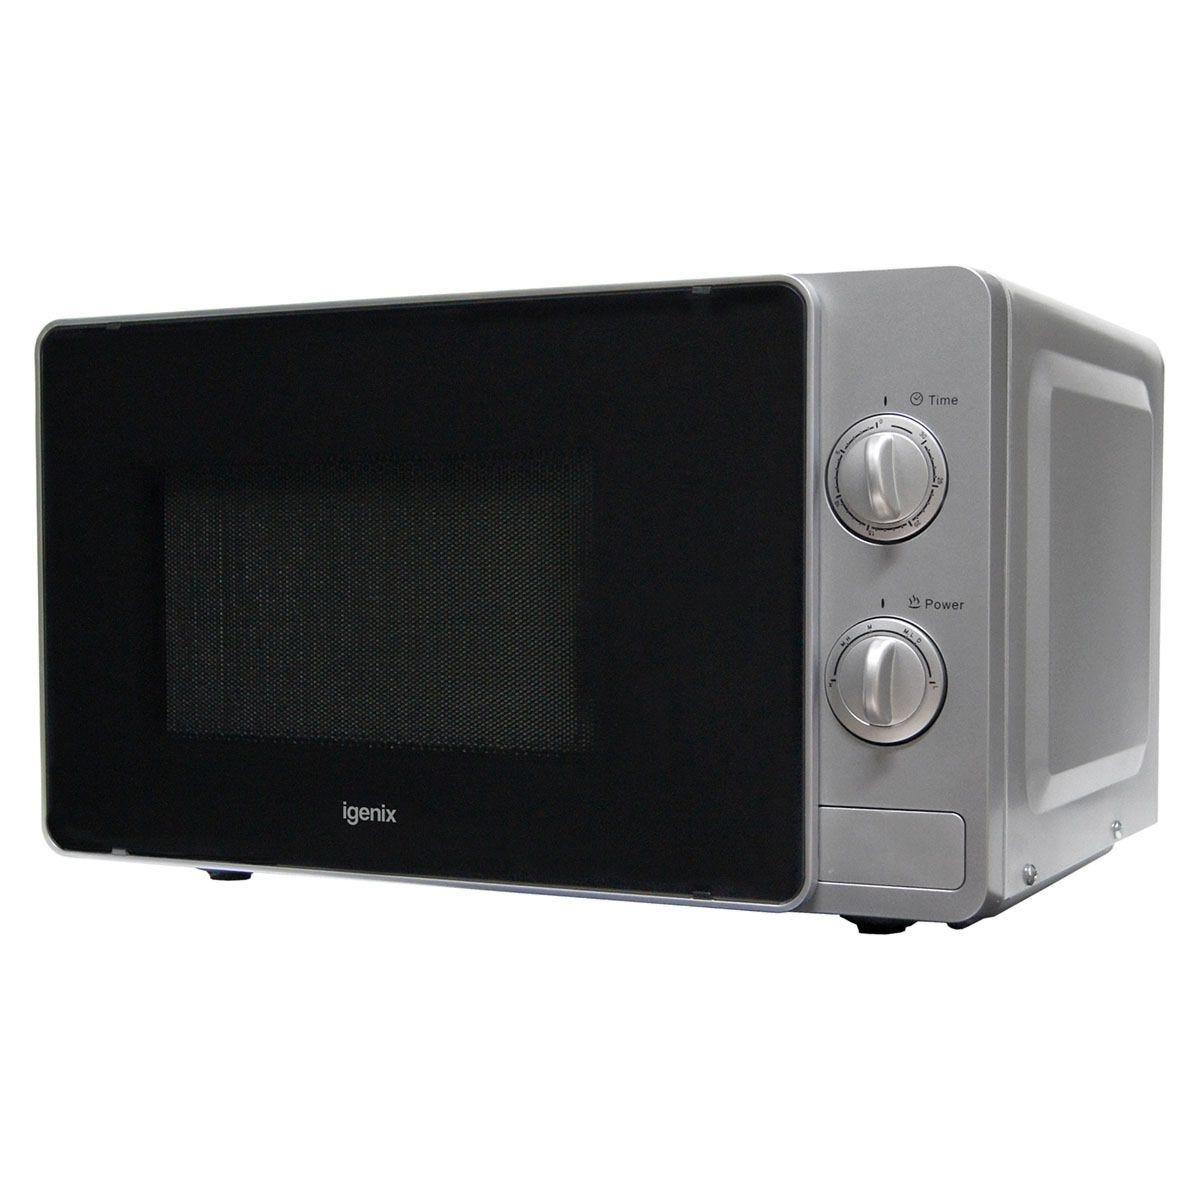 Igenix IG2081S 20L 800W Manual Microwave - Silver